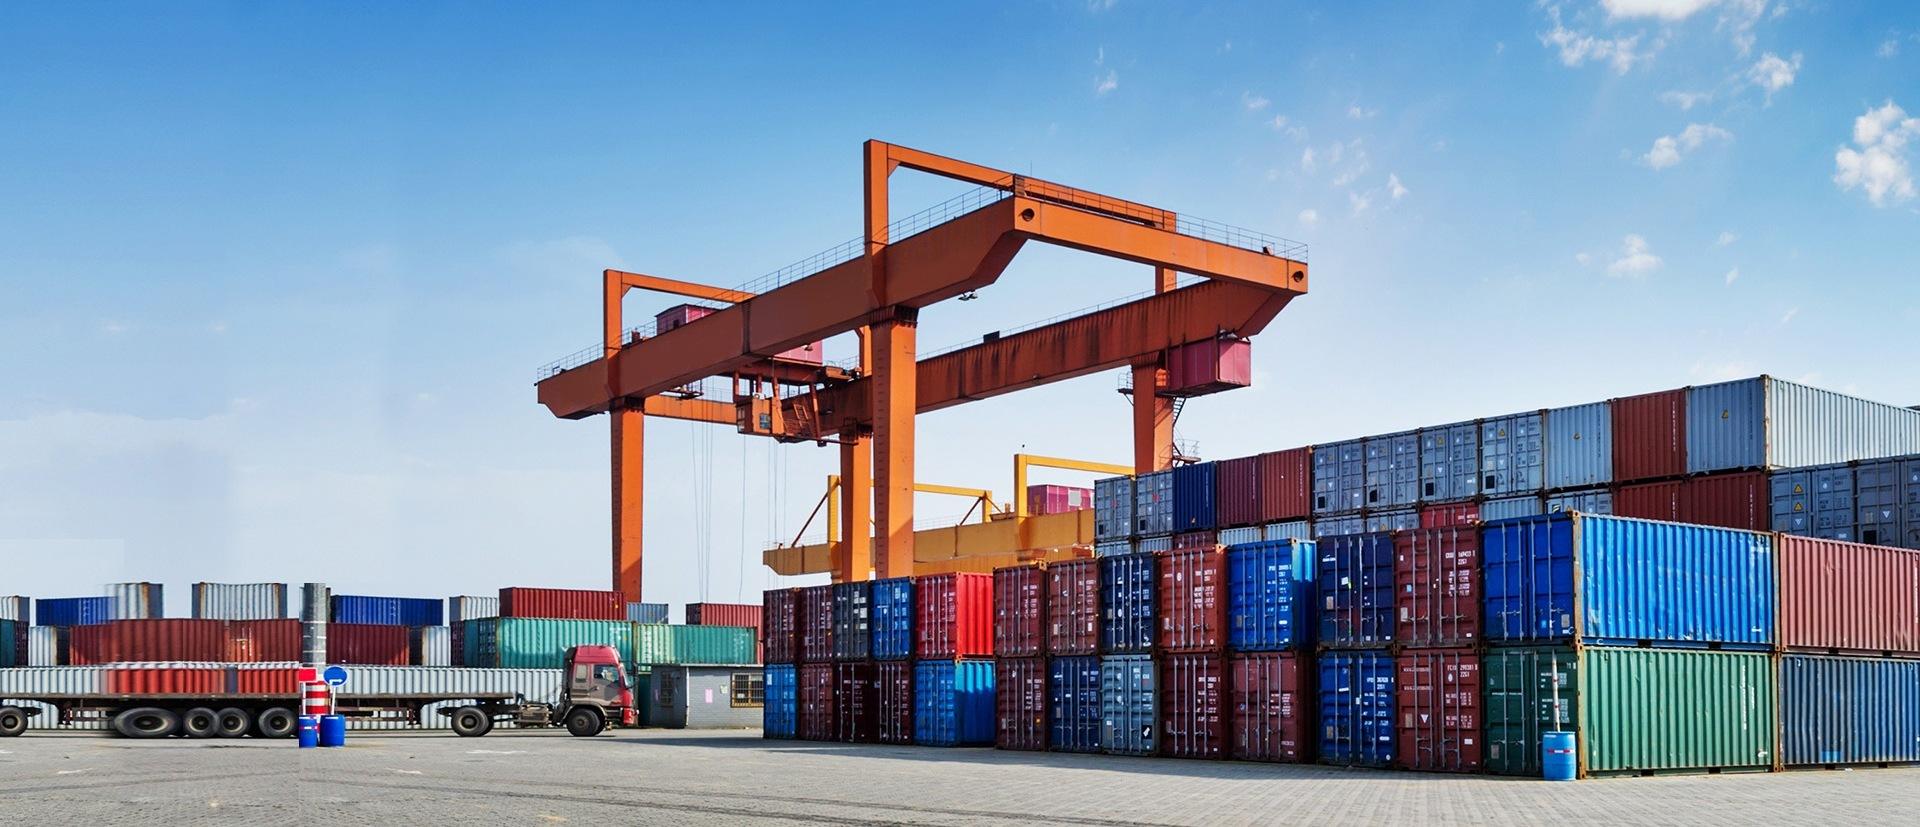 AISL - Association of International Shipping Lines, Inc